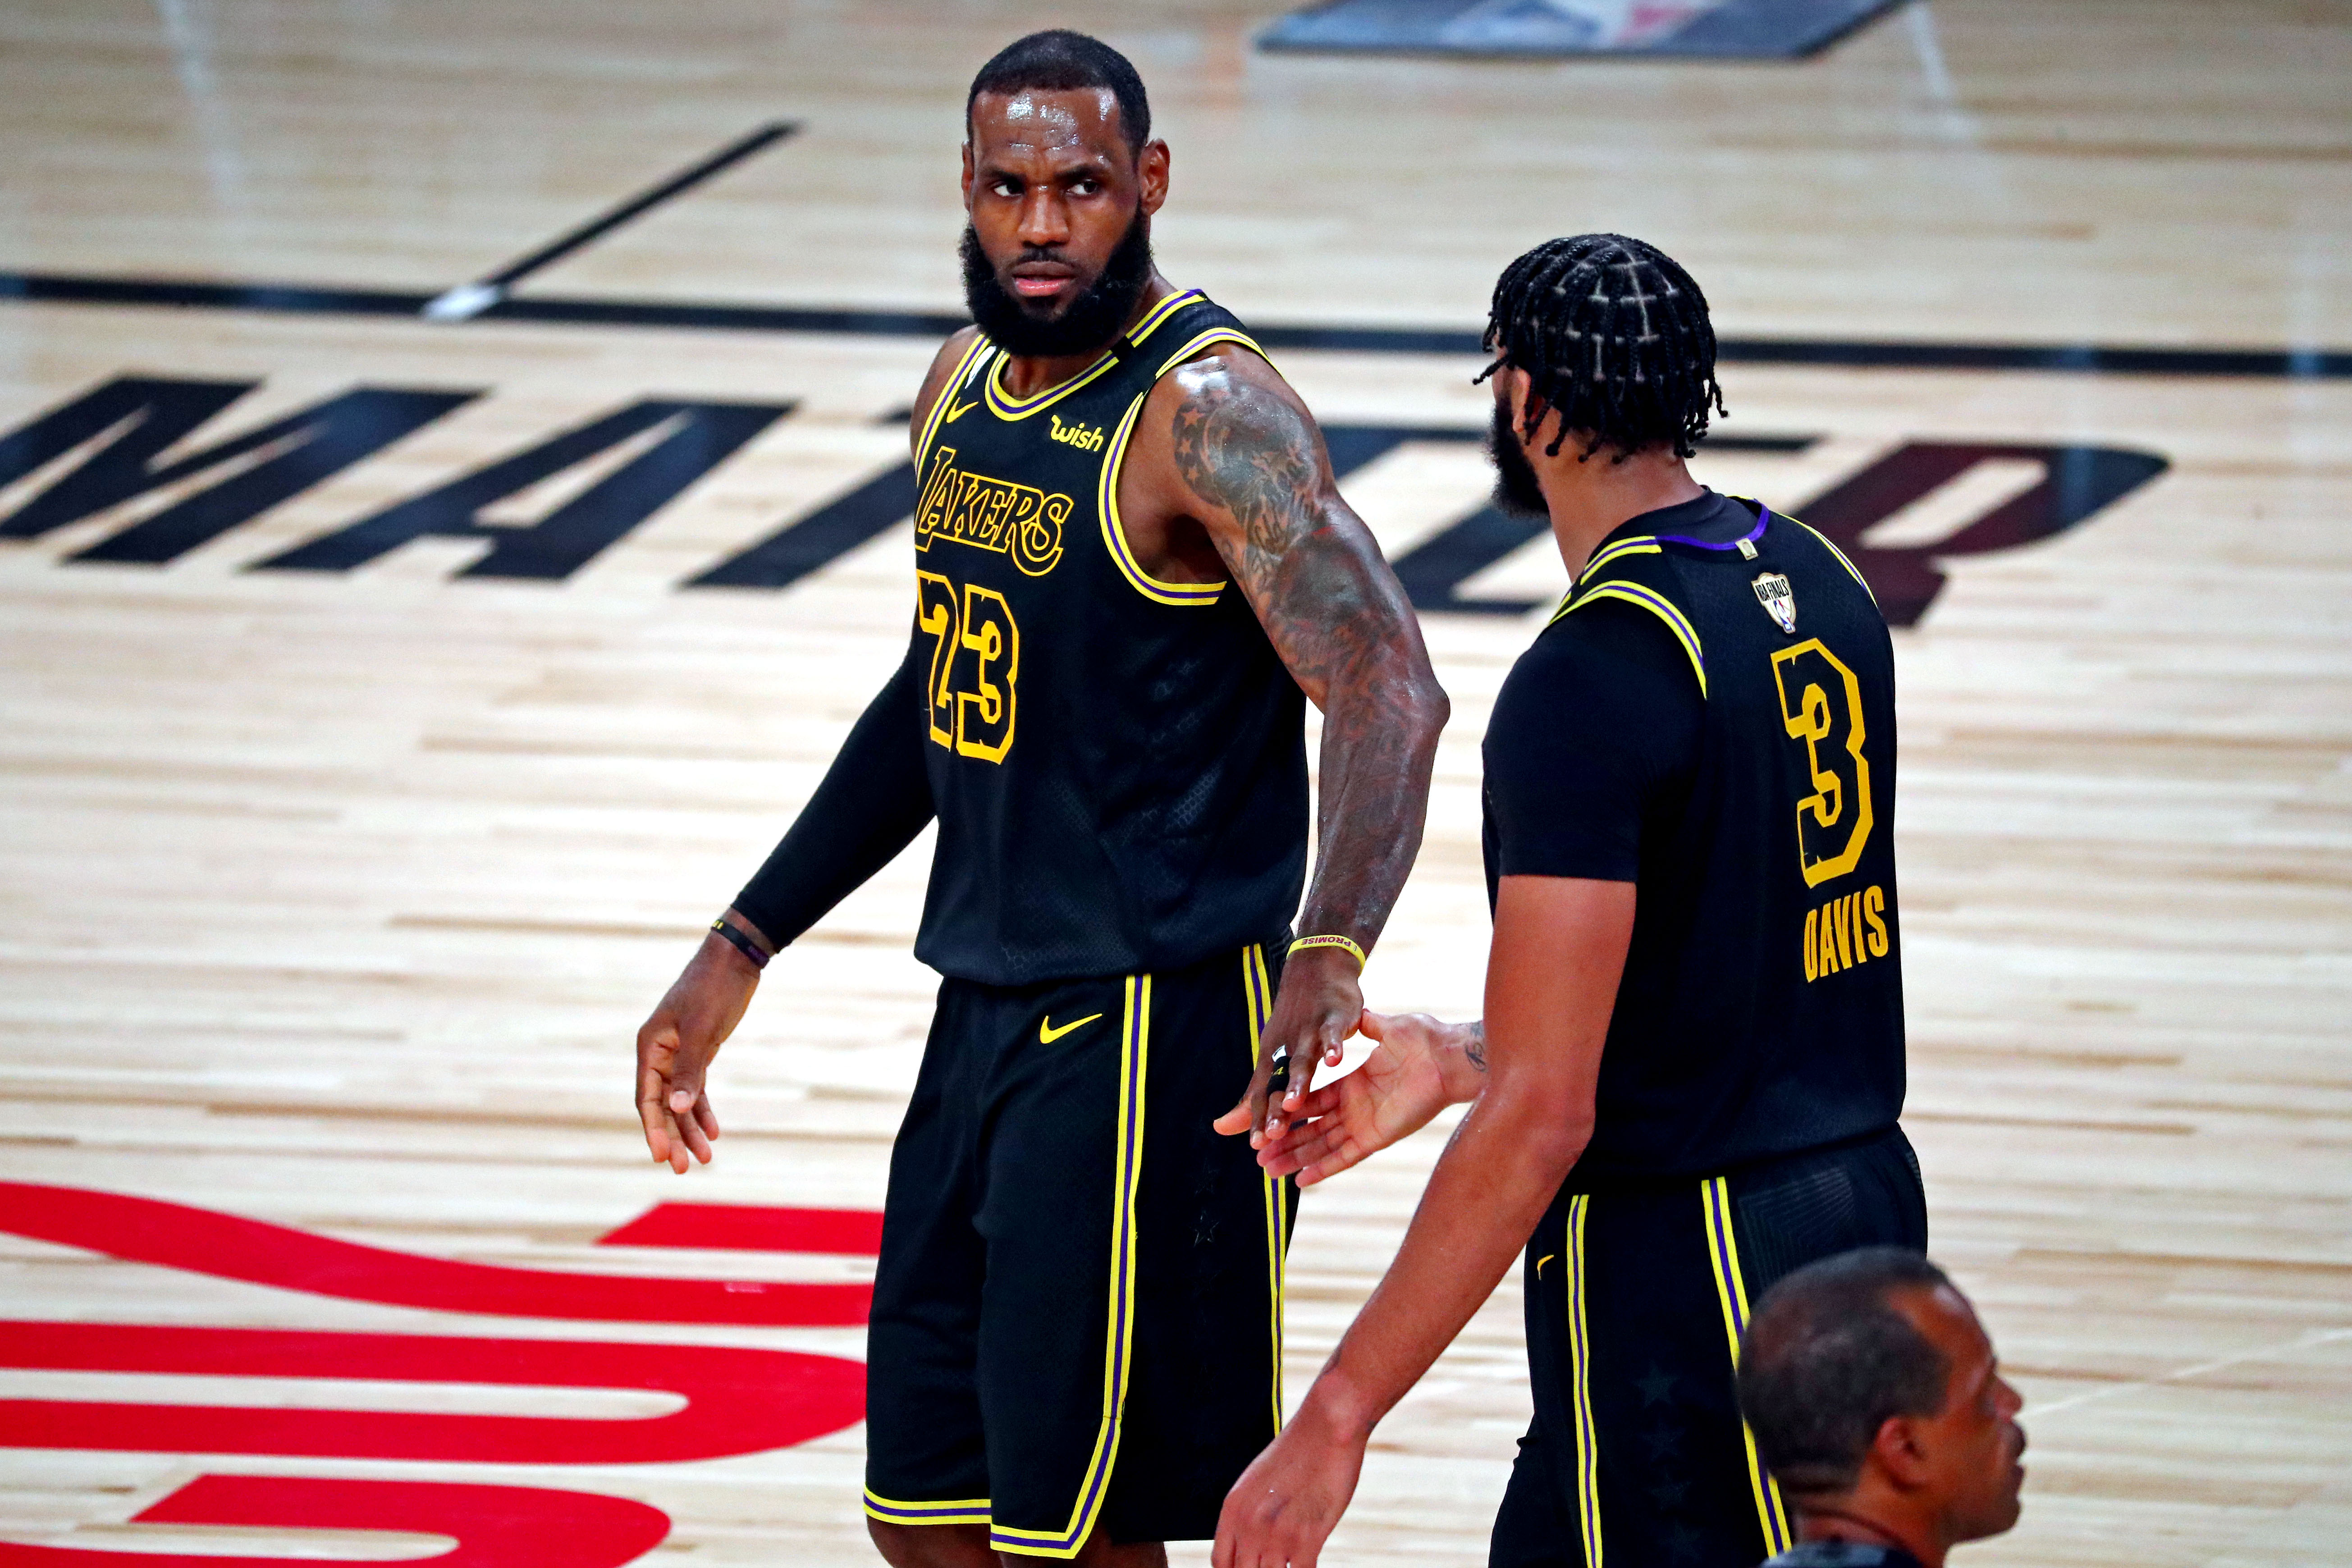 Lakers Free Agency 2020 Targets Rumors LeBron James